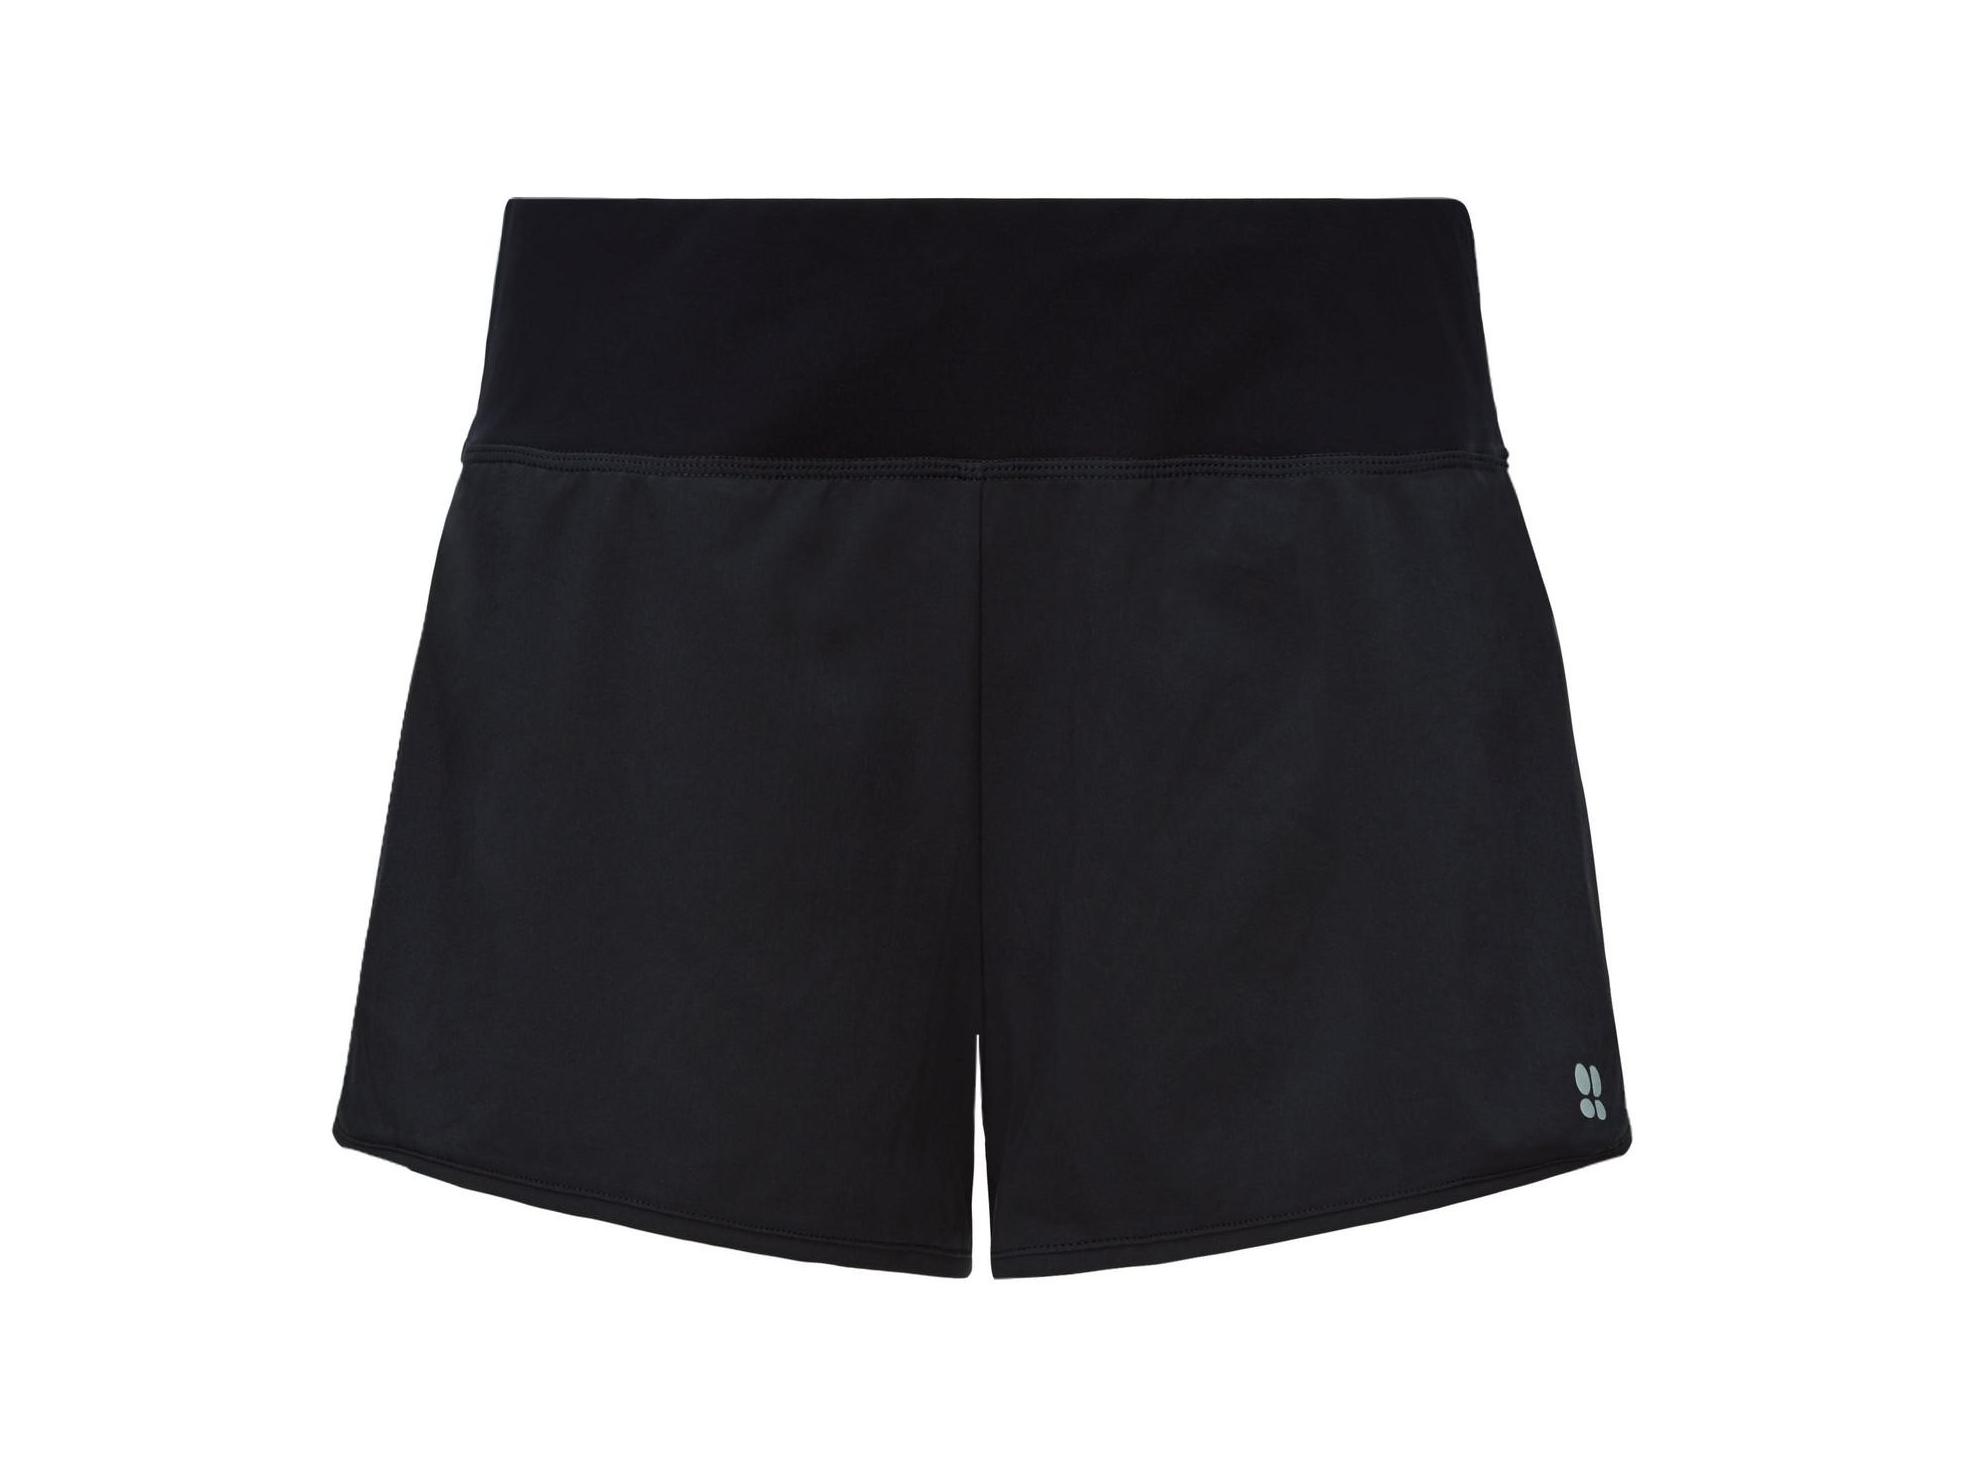 Sex in running shorts photos 465